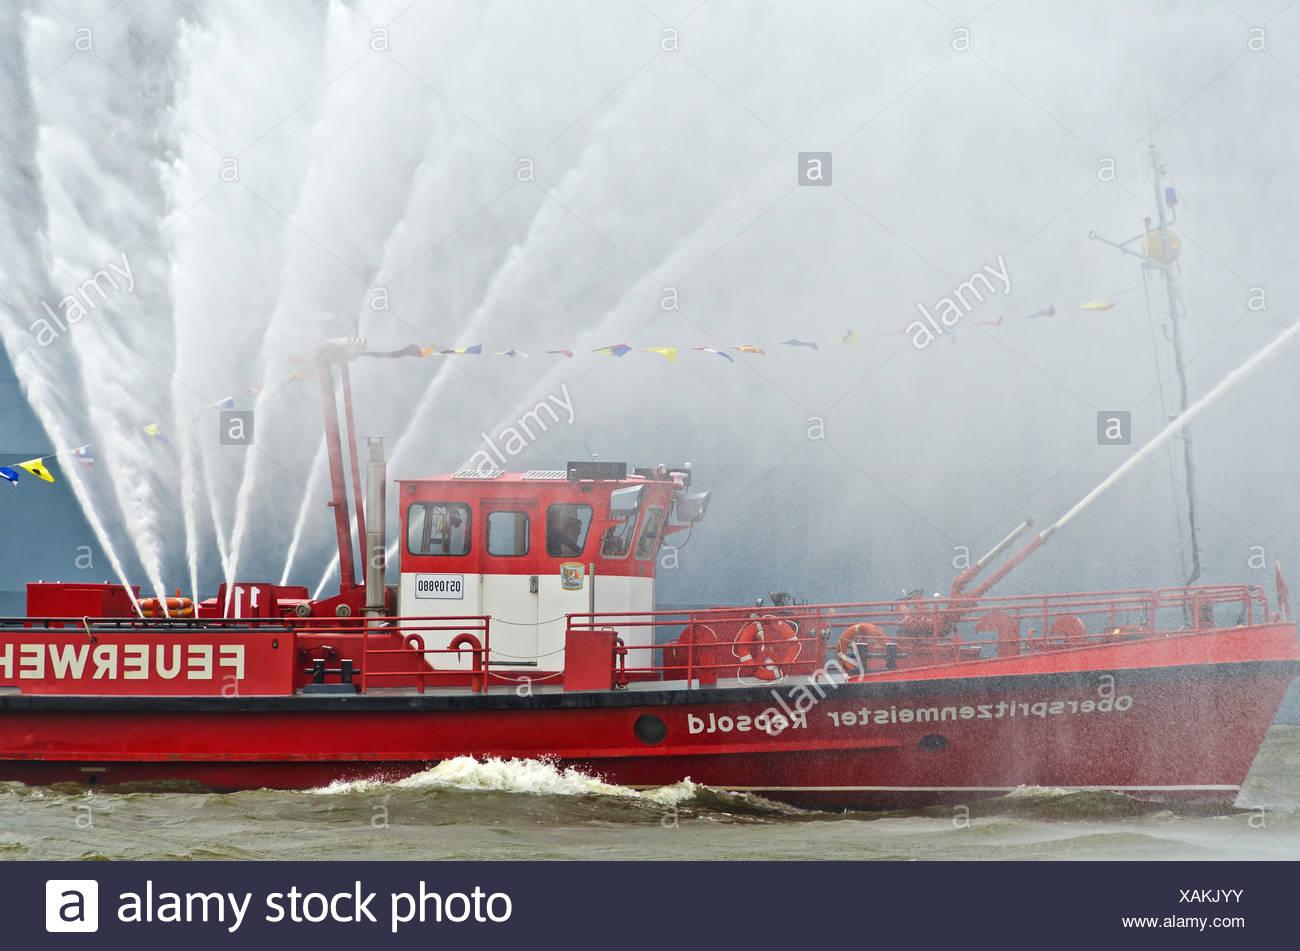 fireboat of the firebrigade Hamburg - Stock Image